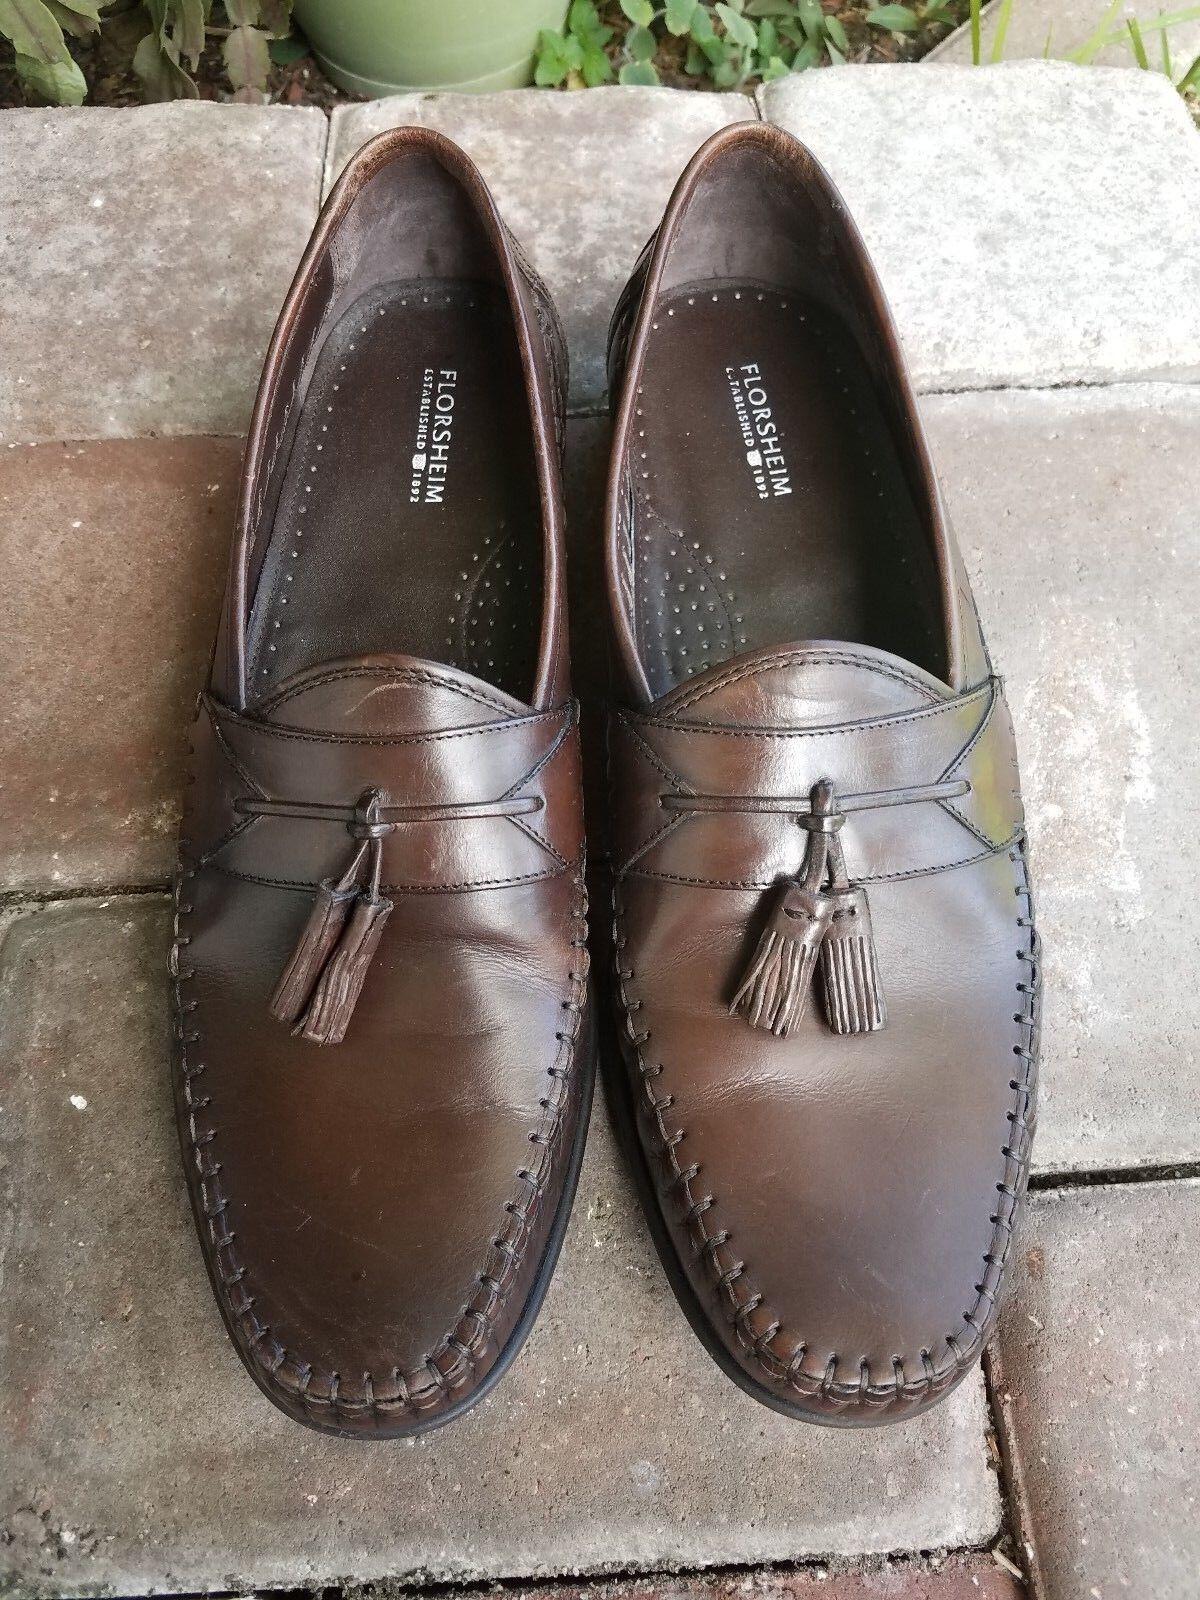 Florsheim Men's Brown Loafers Leather Slip On Tassel Loafers Brown Size 12 M 5507d1